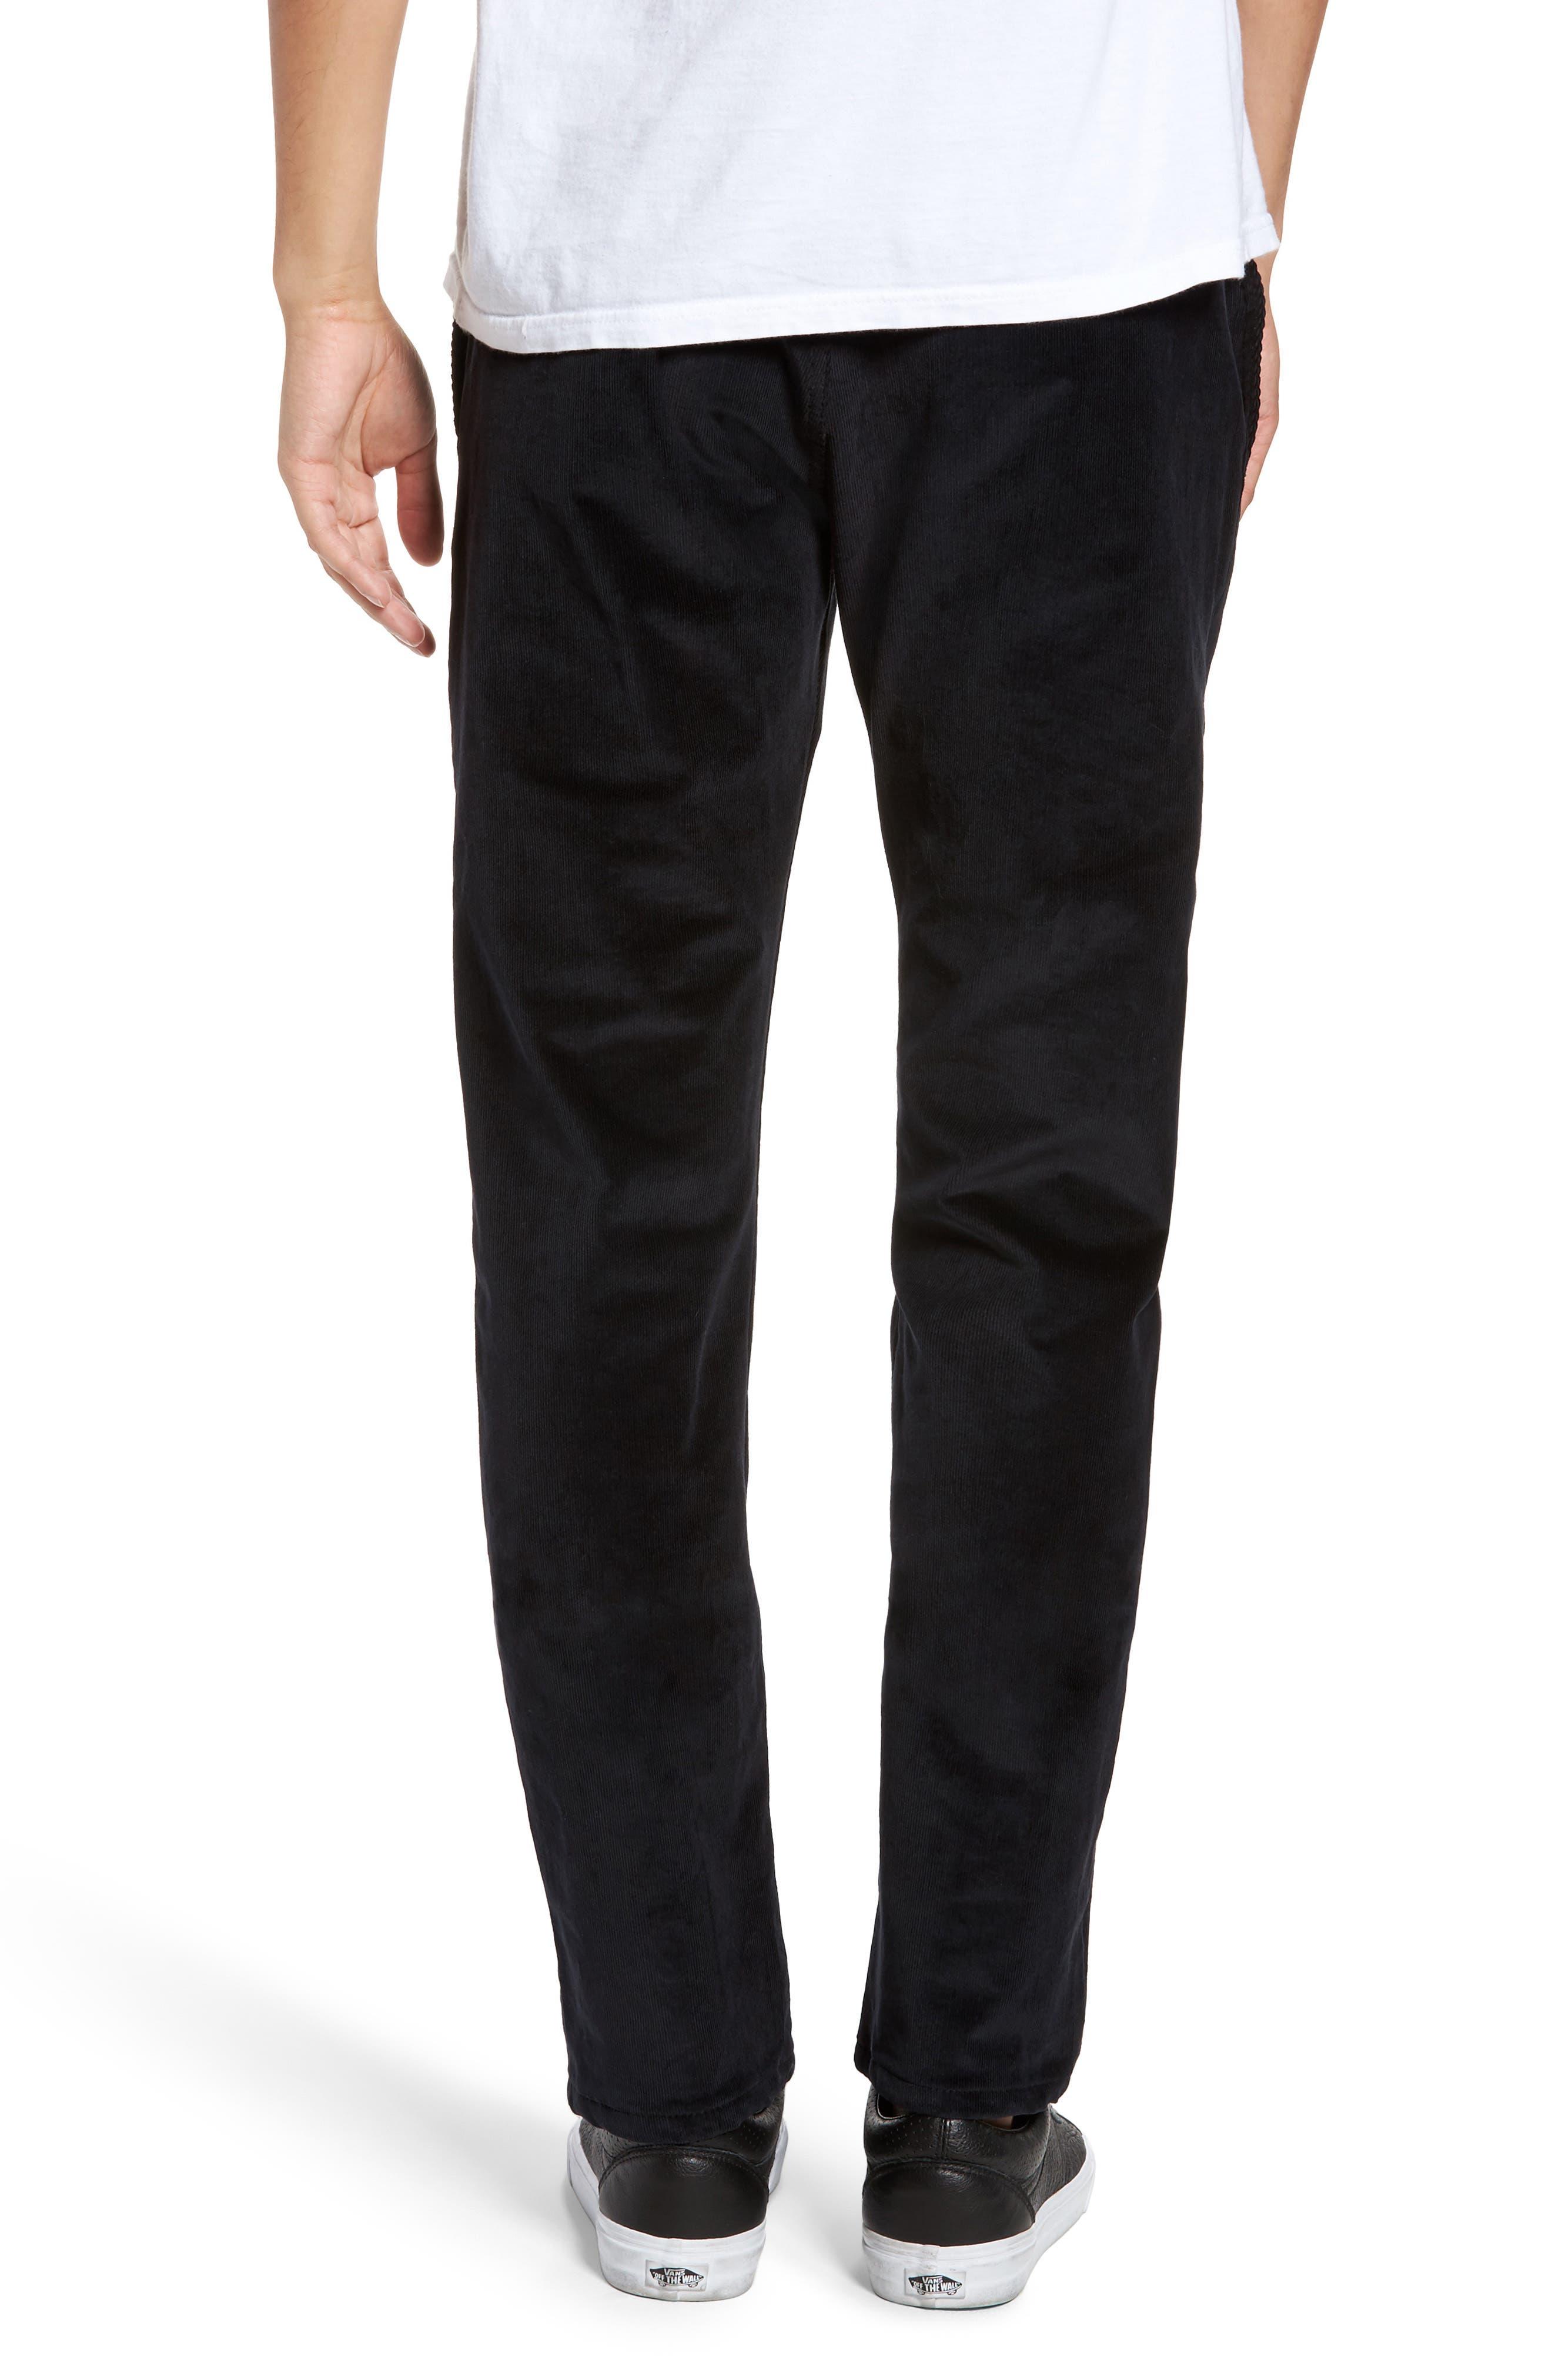 Naked & Famous Slim Chino Slim Fit Corduroy Pants,                             Alternate thumbnail 2, color,                             Black